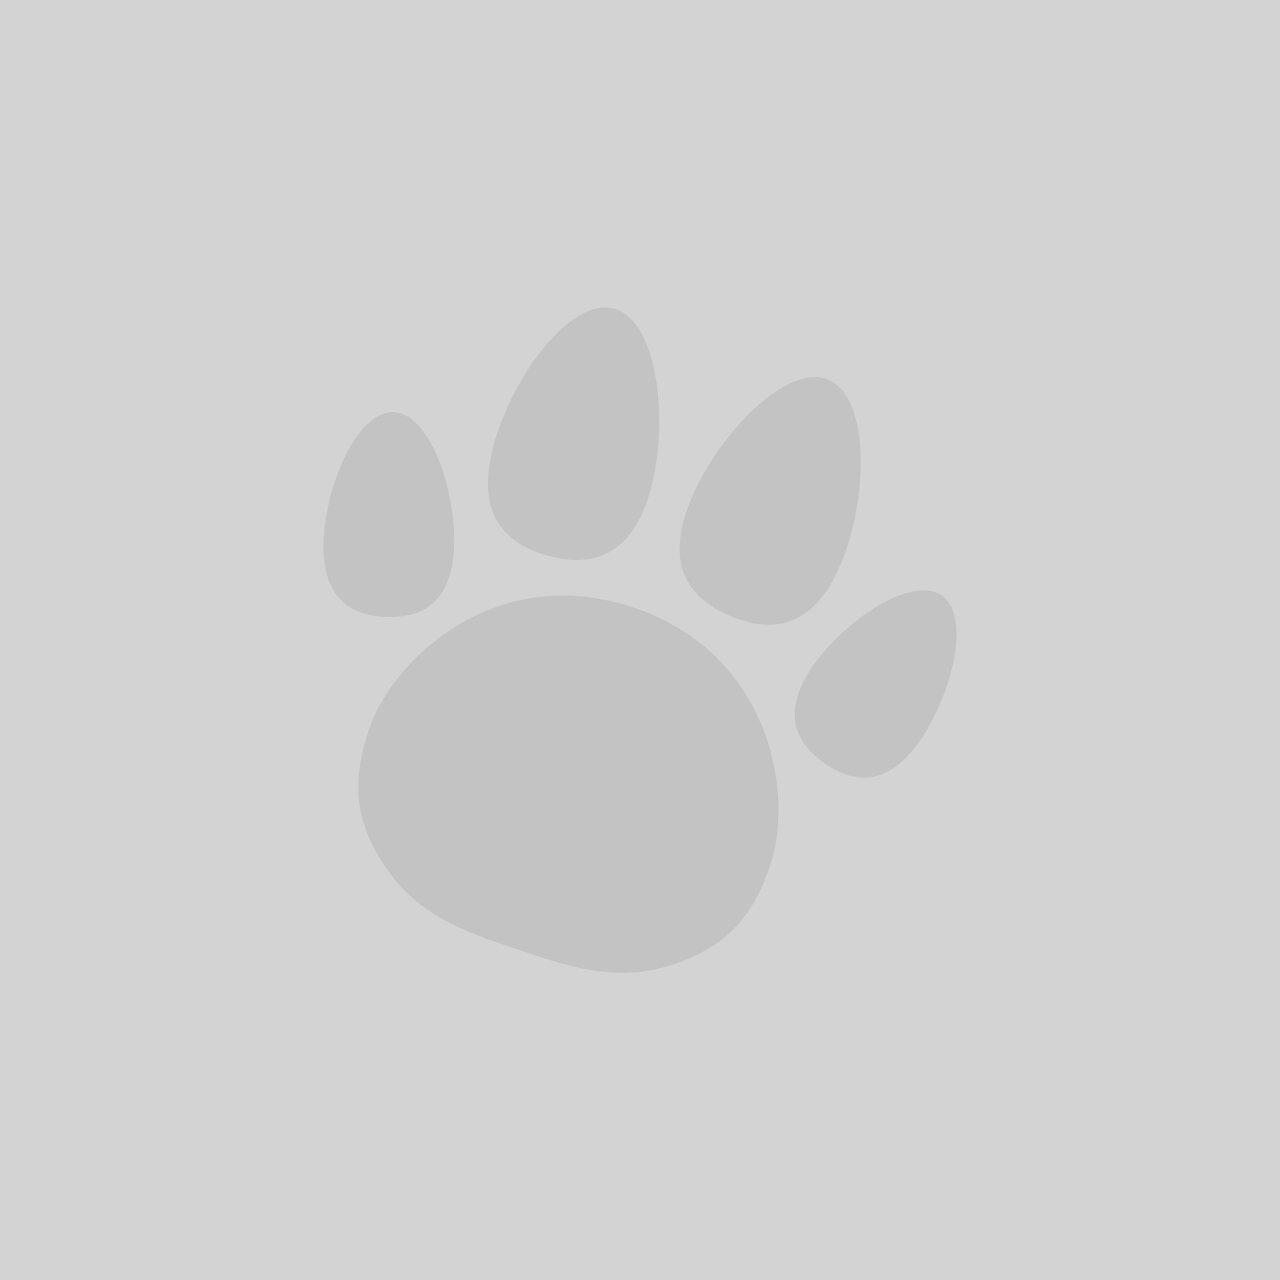 Iams Puppy & Junior Dry Dog Food Large Chicken 3kg